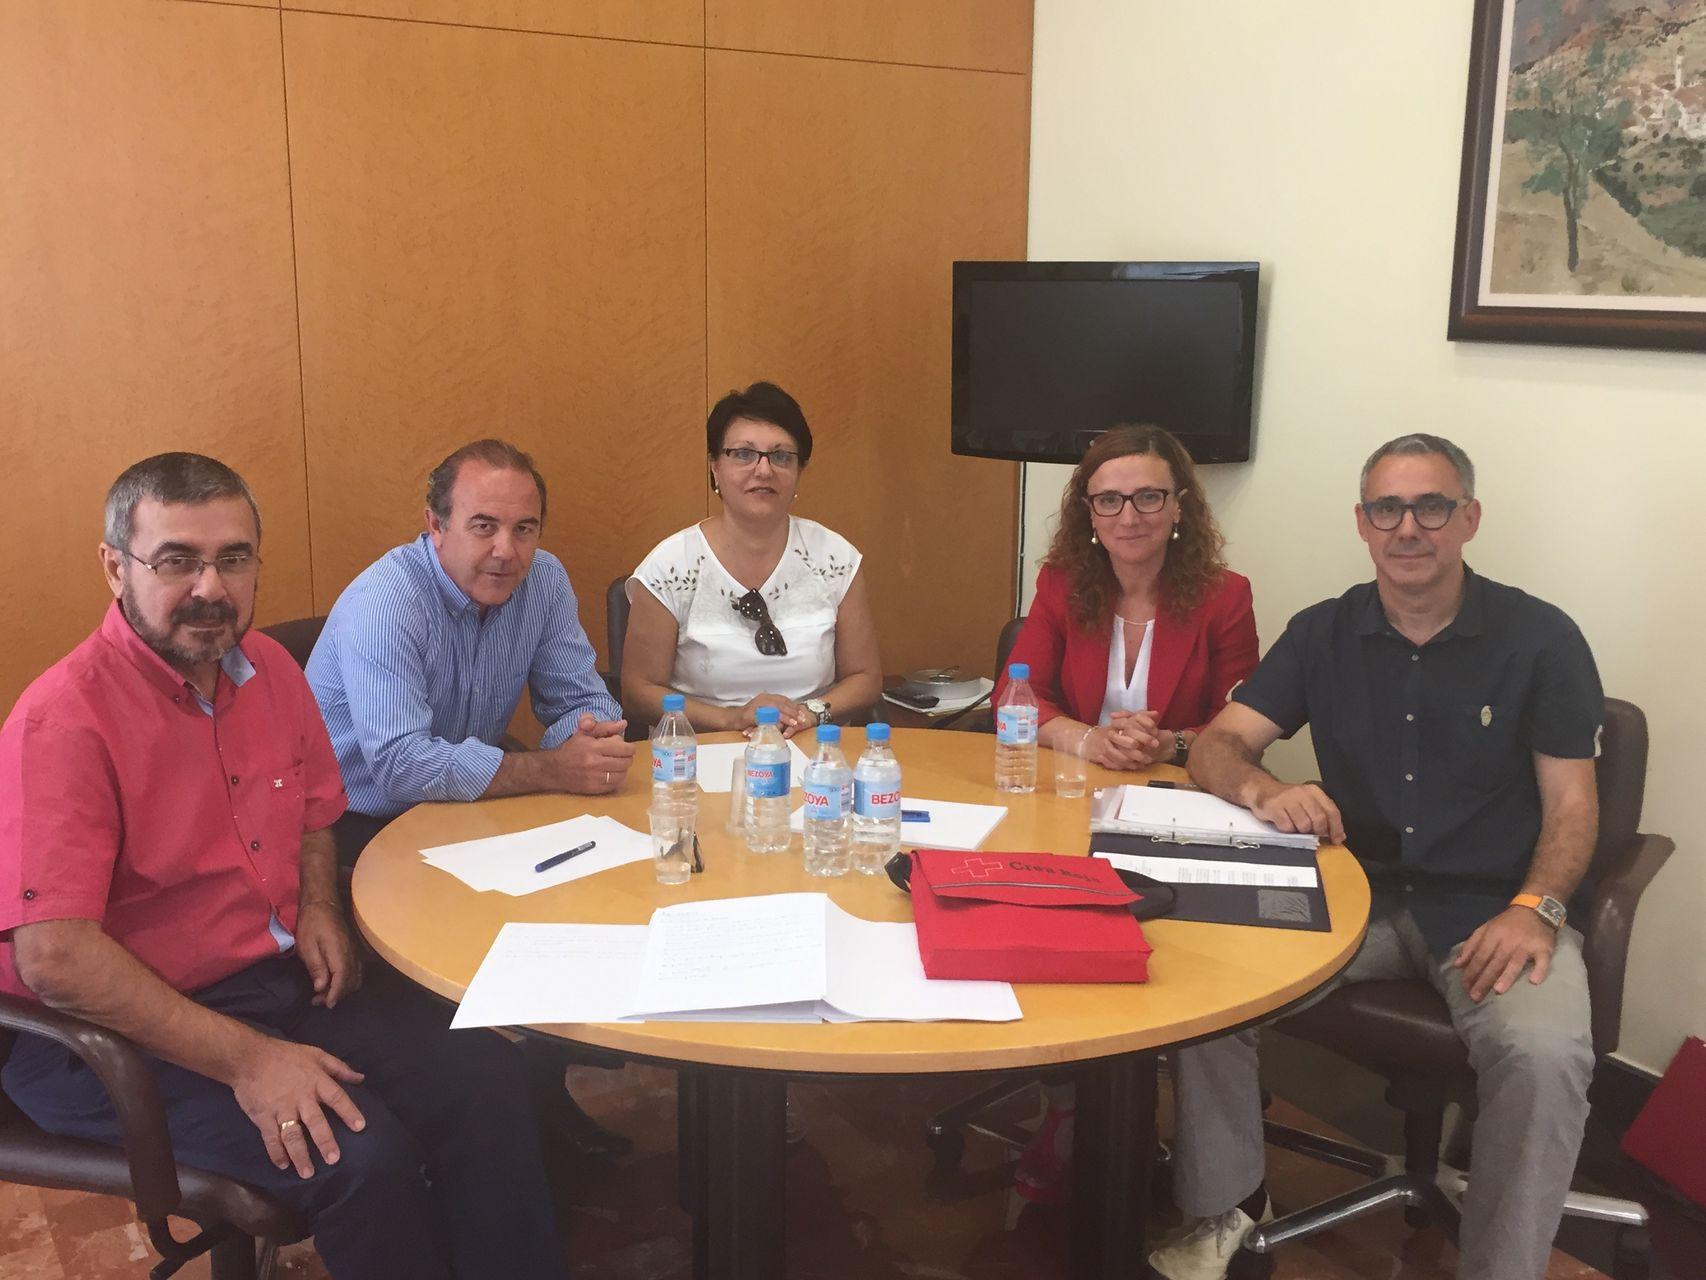 Reunión de trabajo en materia de menores con responsables de Cruz Roja